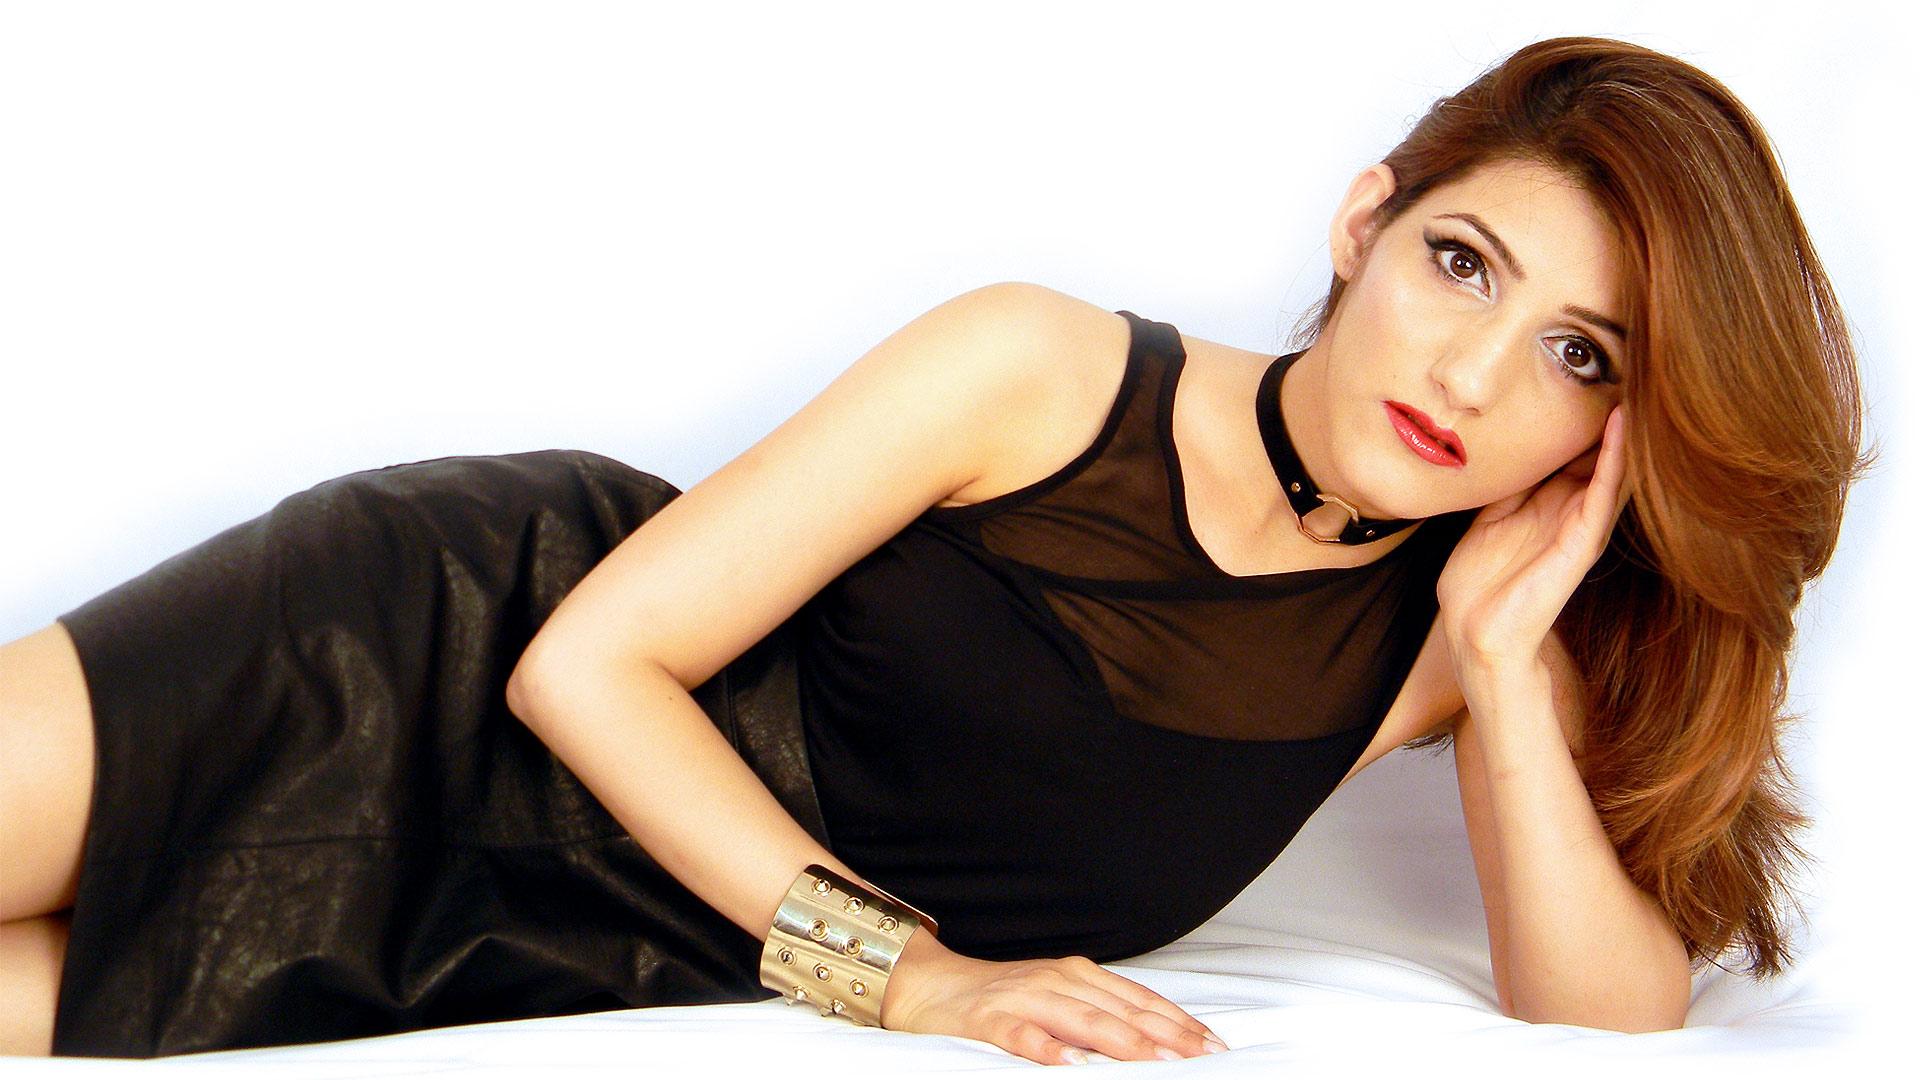 shilpa-ahuja-fashion-sexy-wallpapers-desktop-style-glamorous